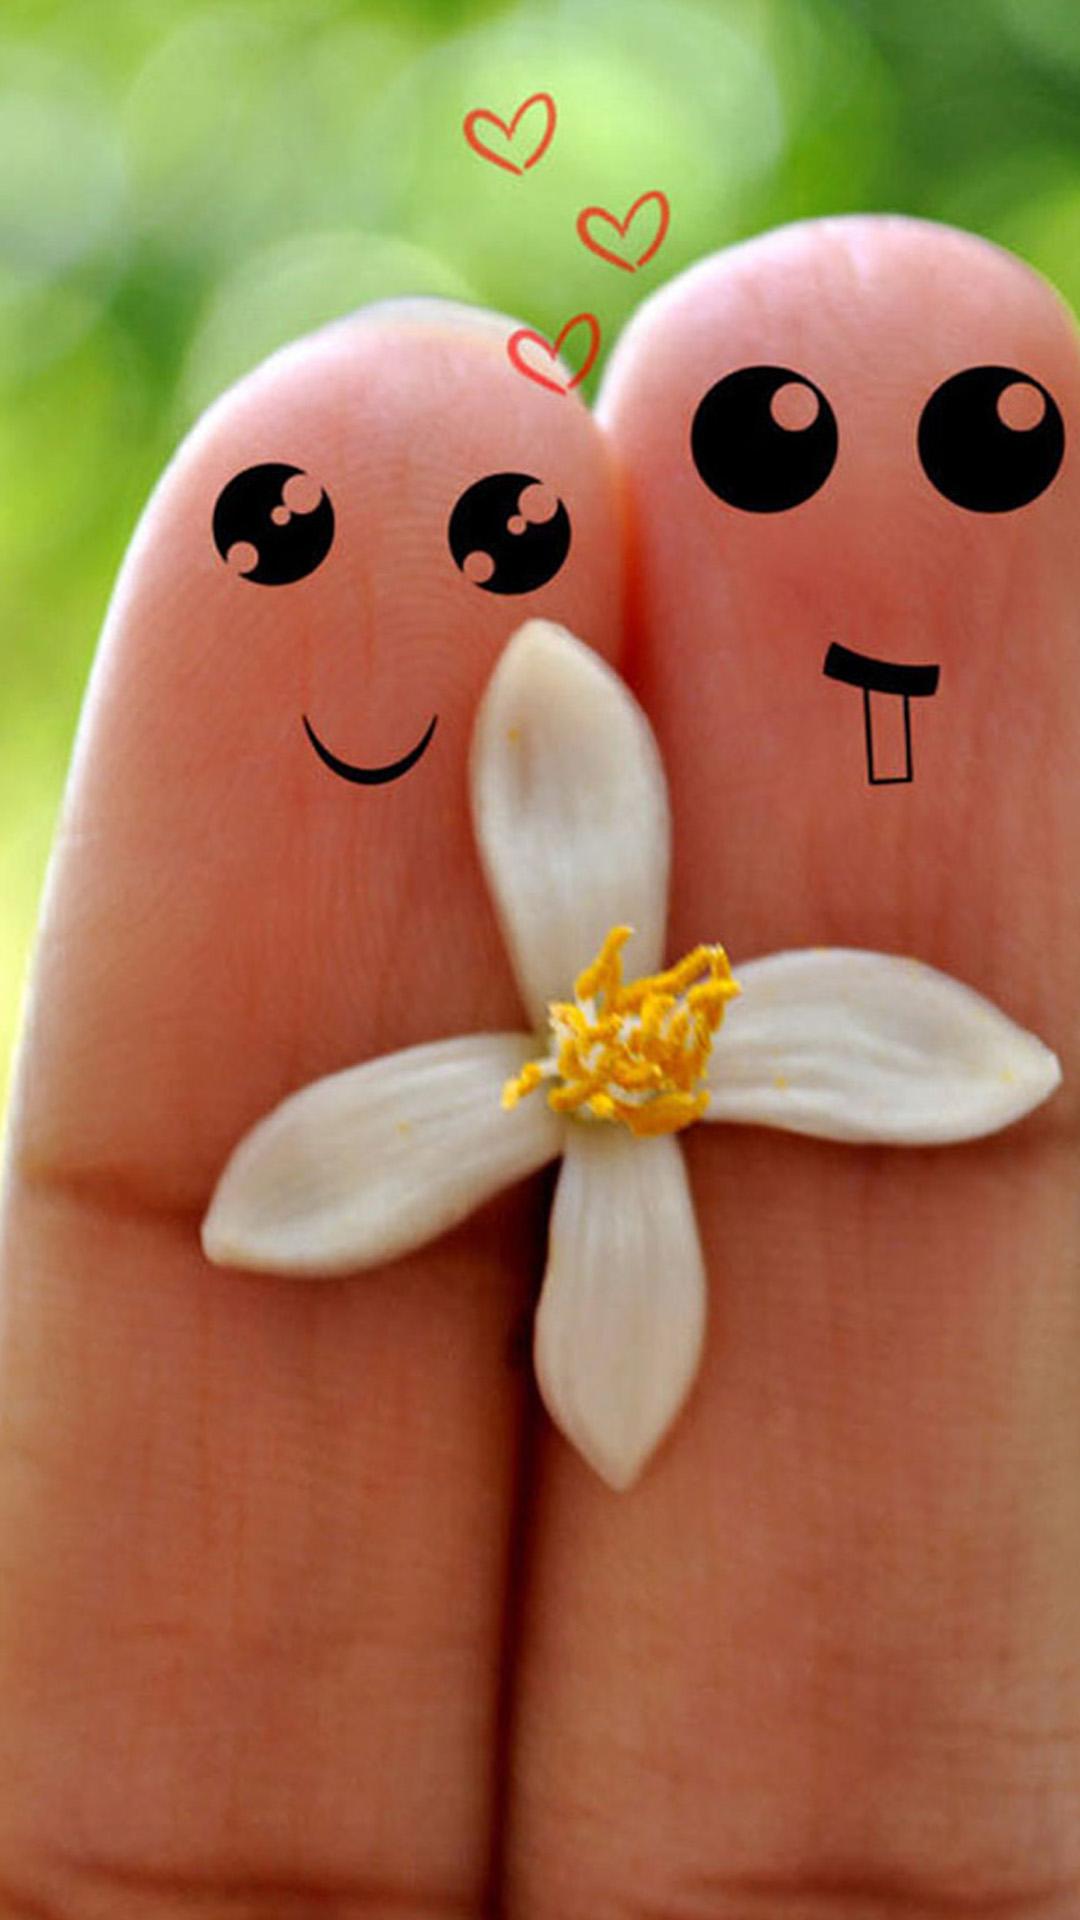 Cute-Love-Cartoon-Couple-Fingers-iPhone-wallpaper-wp5006434